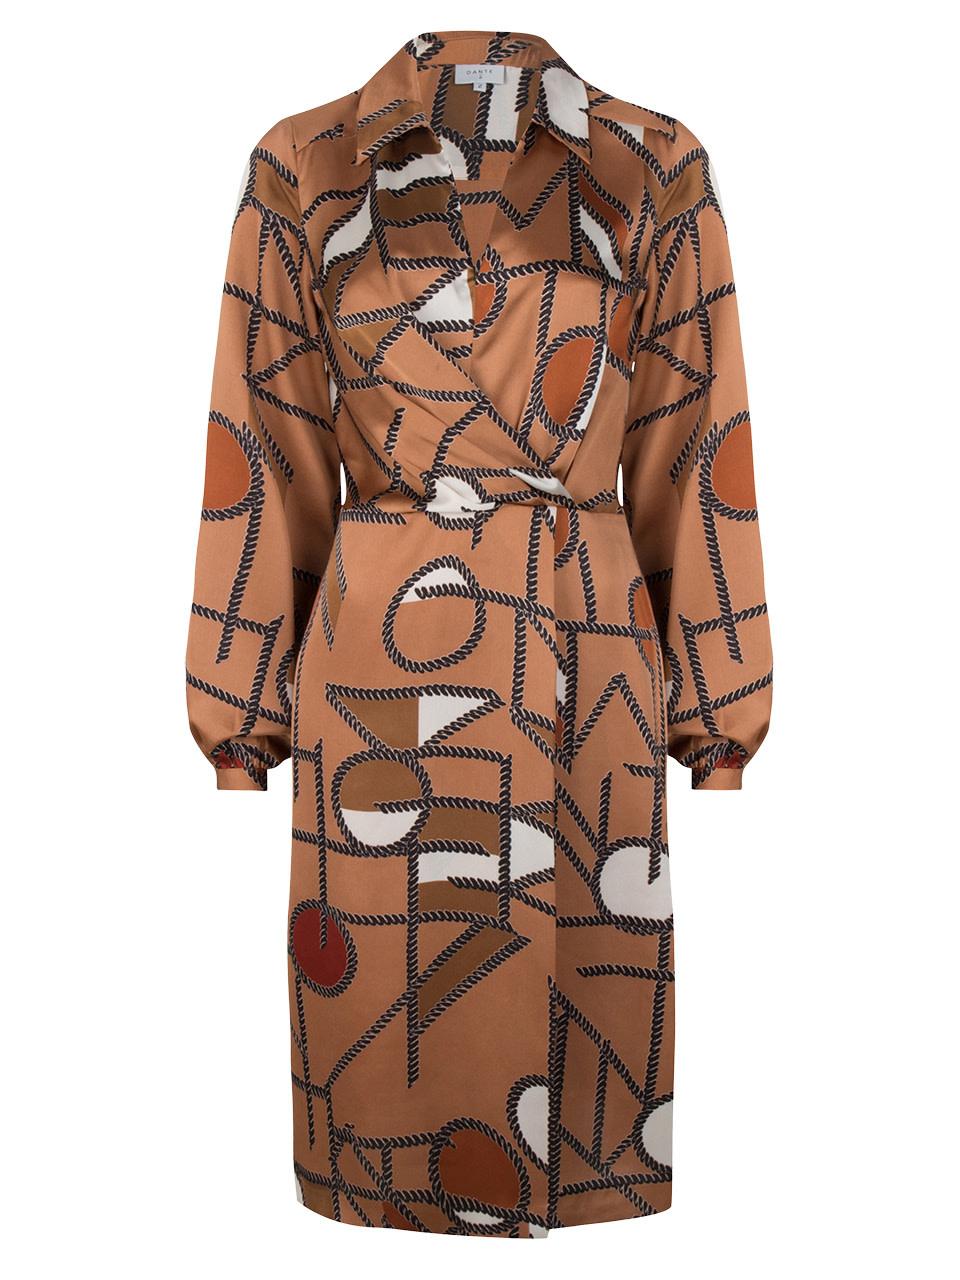 Madison chain print dress long-4